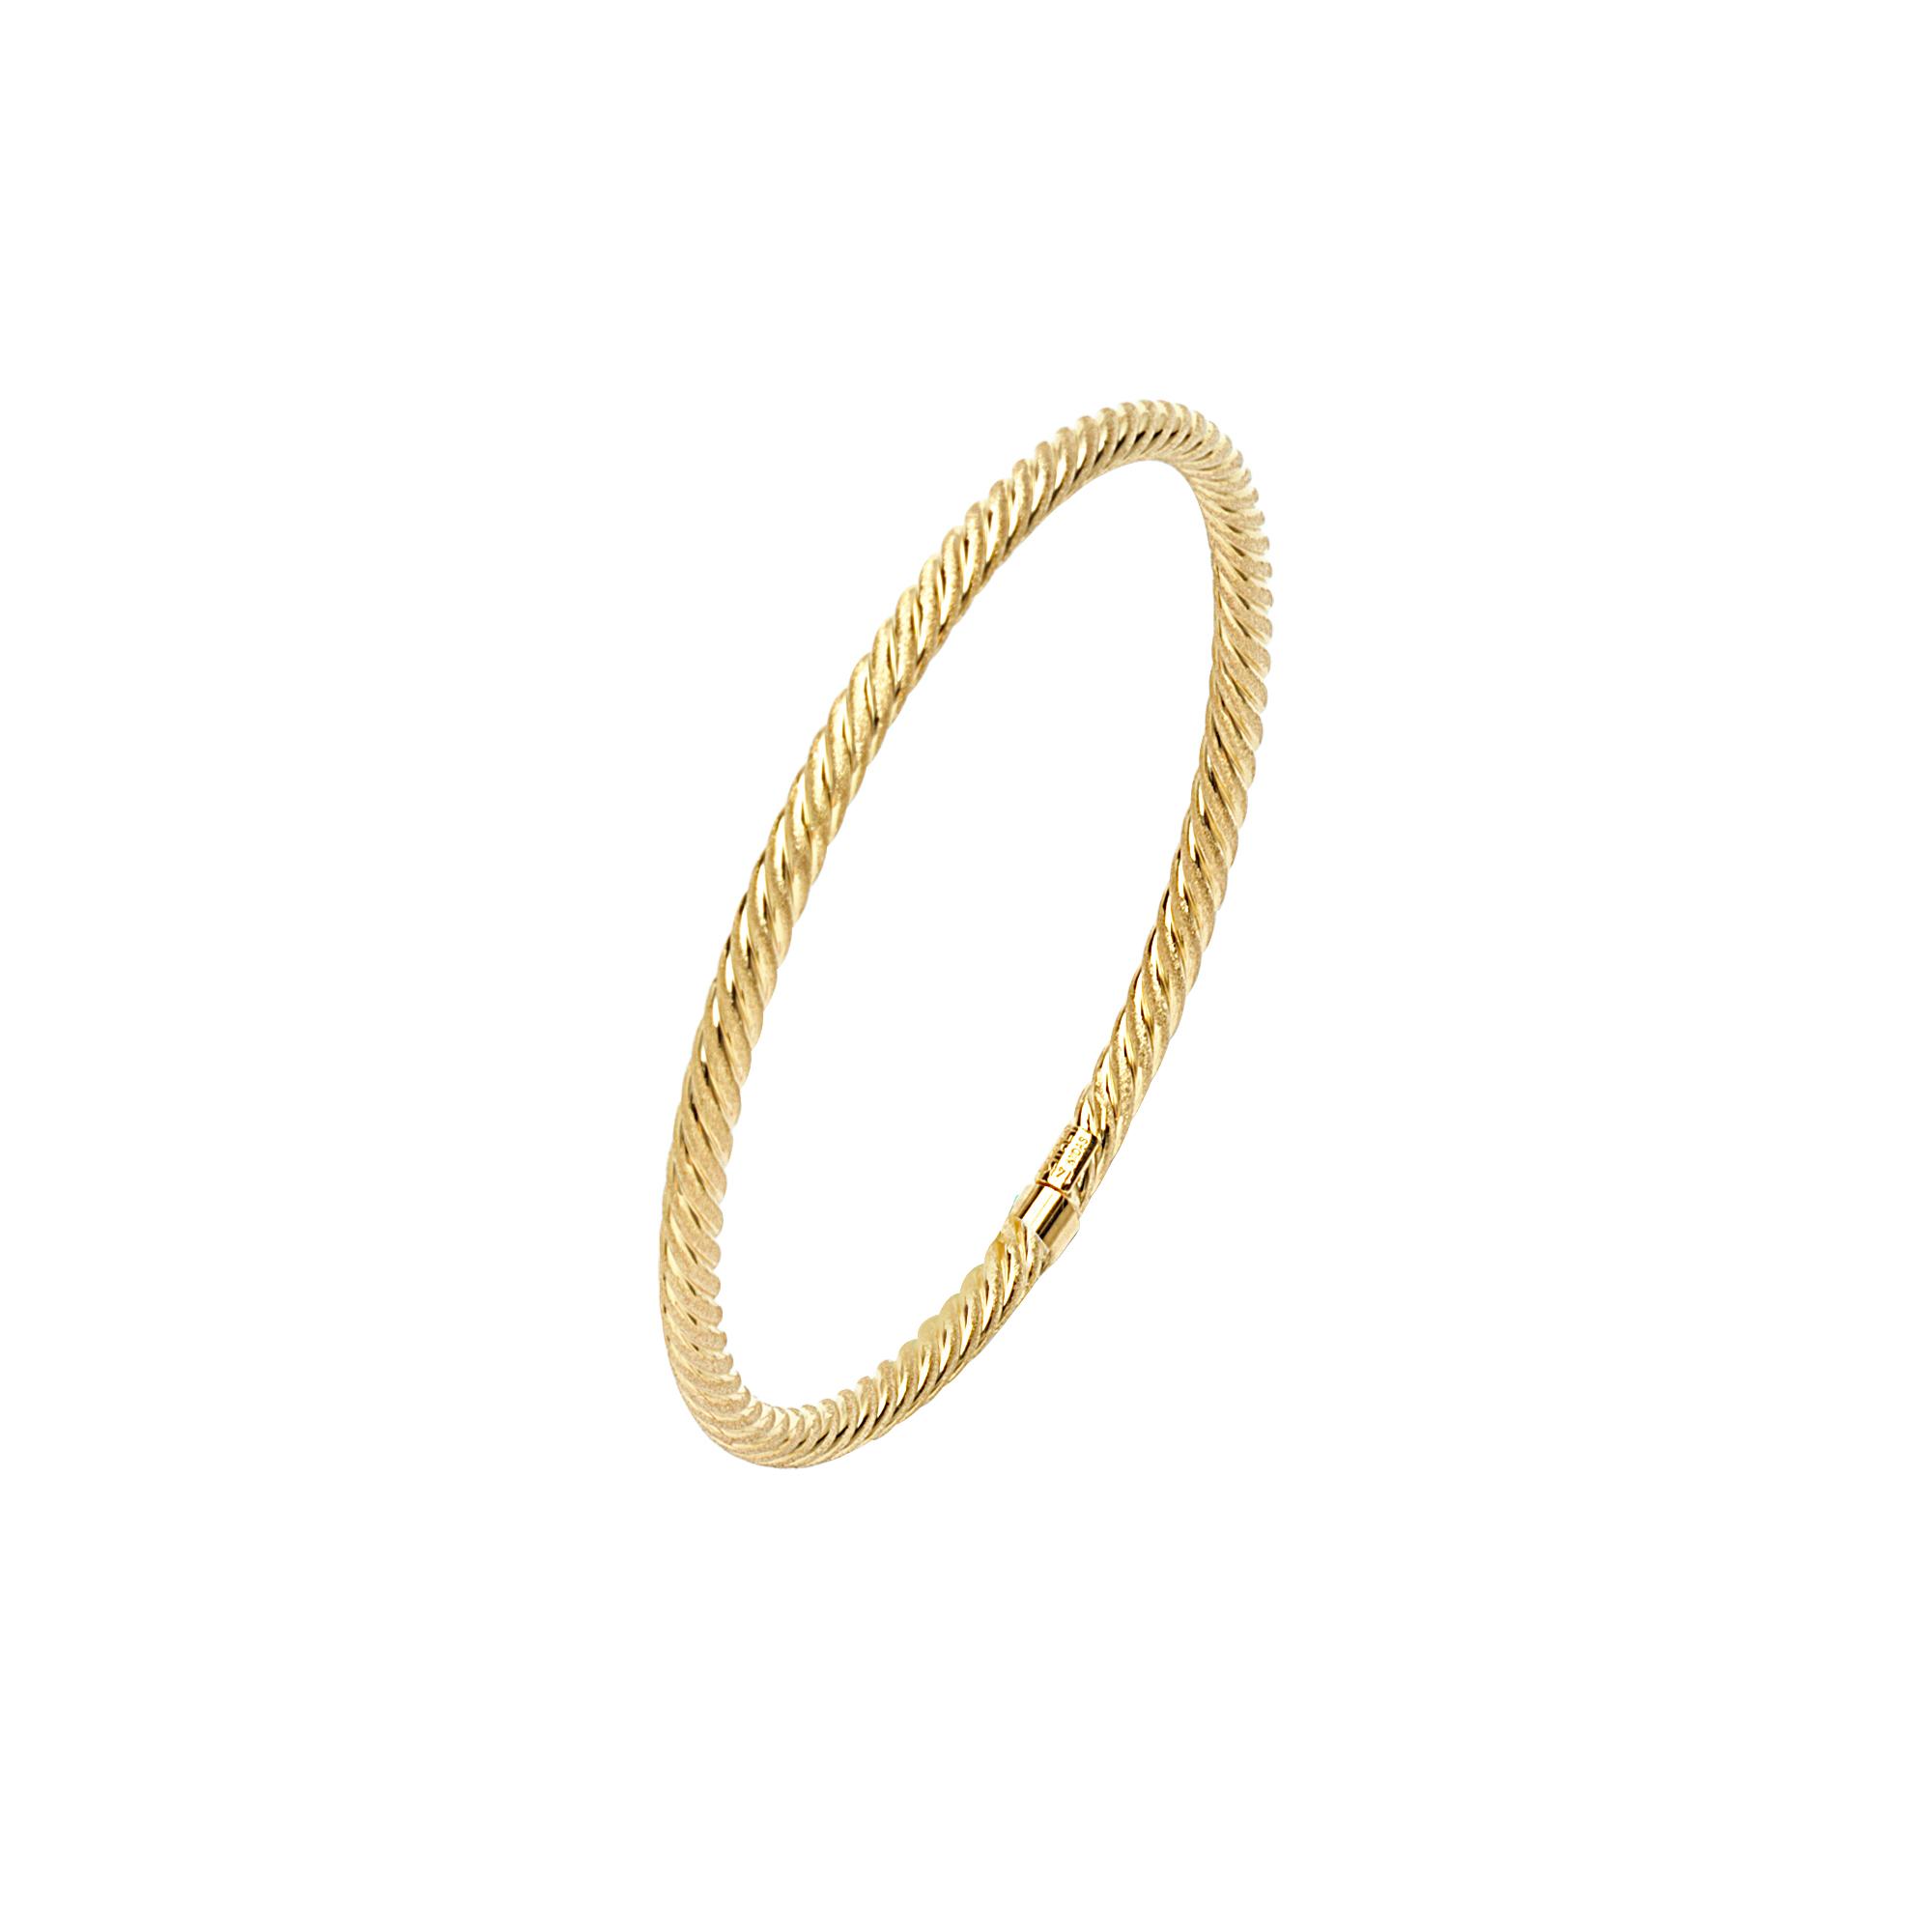 Bangle, 14K Gold Bangle 7.75